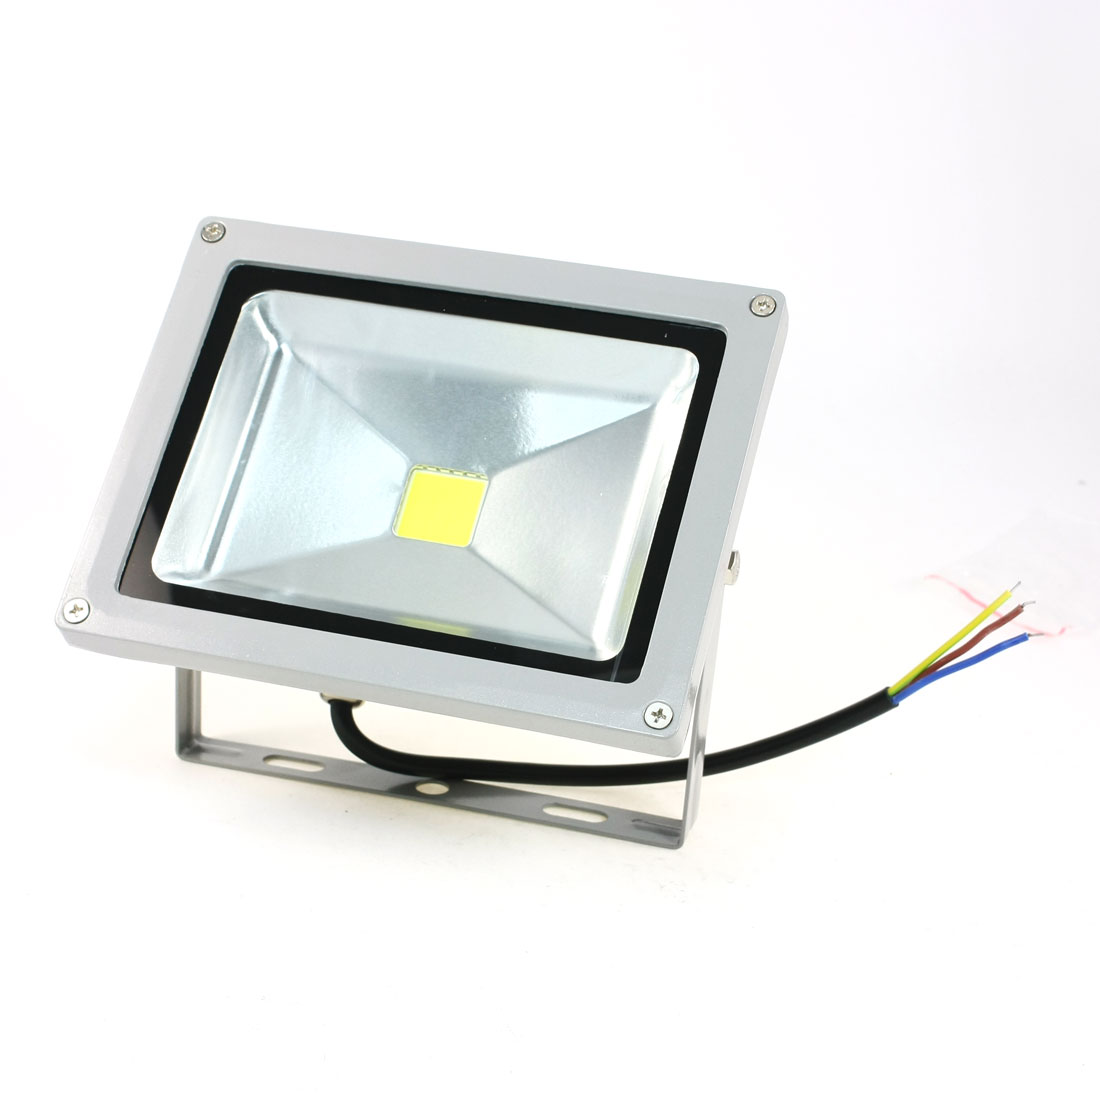 Outdoor Waterproof 30W White LED Flood Spotlight Lamp Bulb AC 85-275V